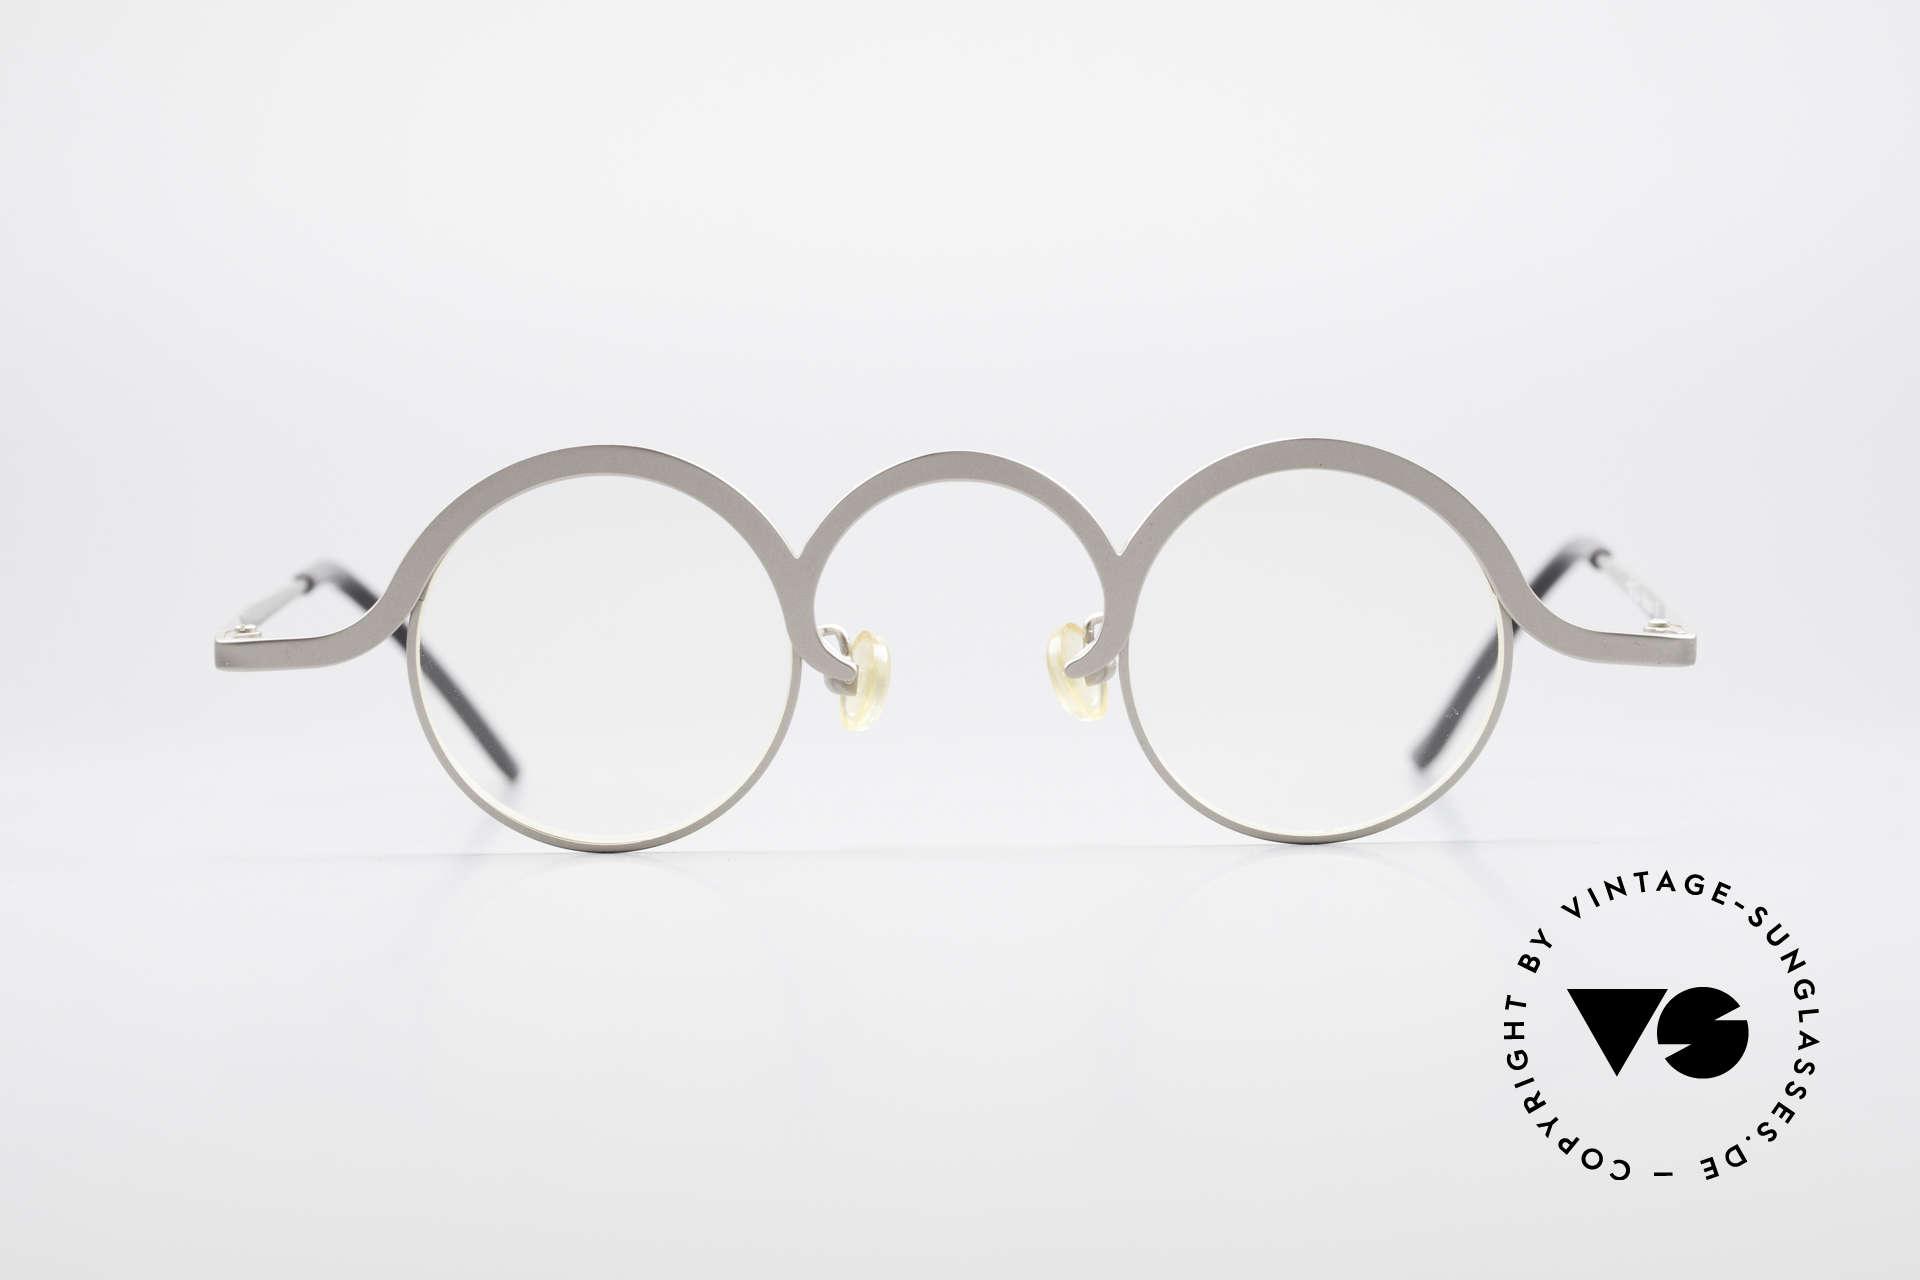 7d29b5601f9 Glasses Theo Belgium Jeu Avant-Garde Vintage Specs